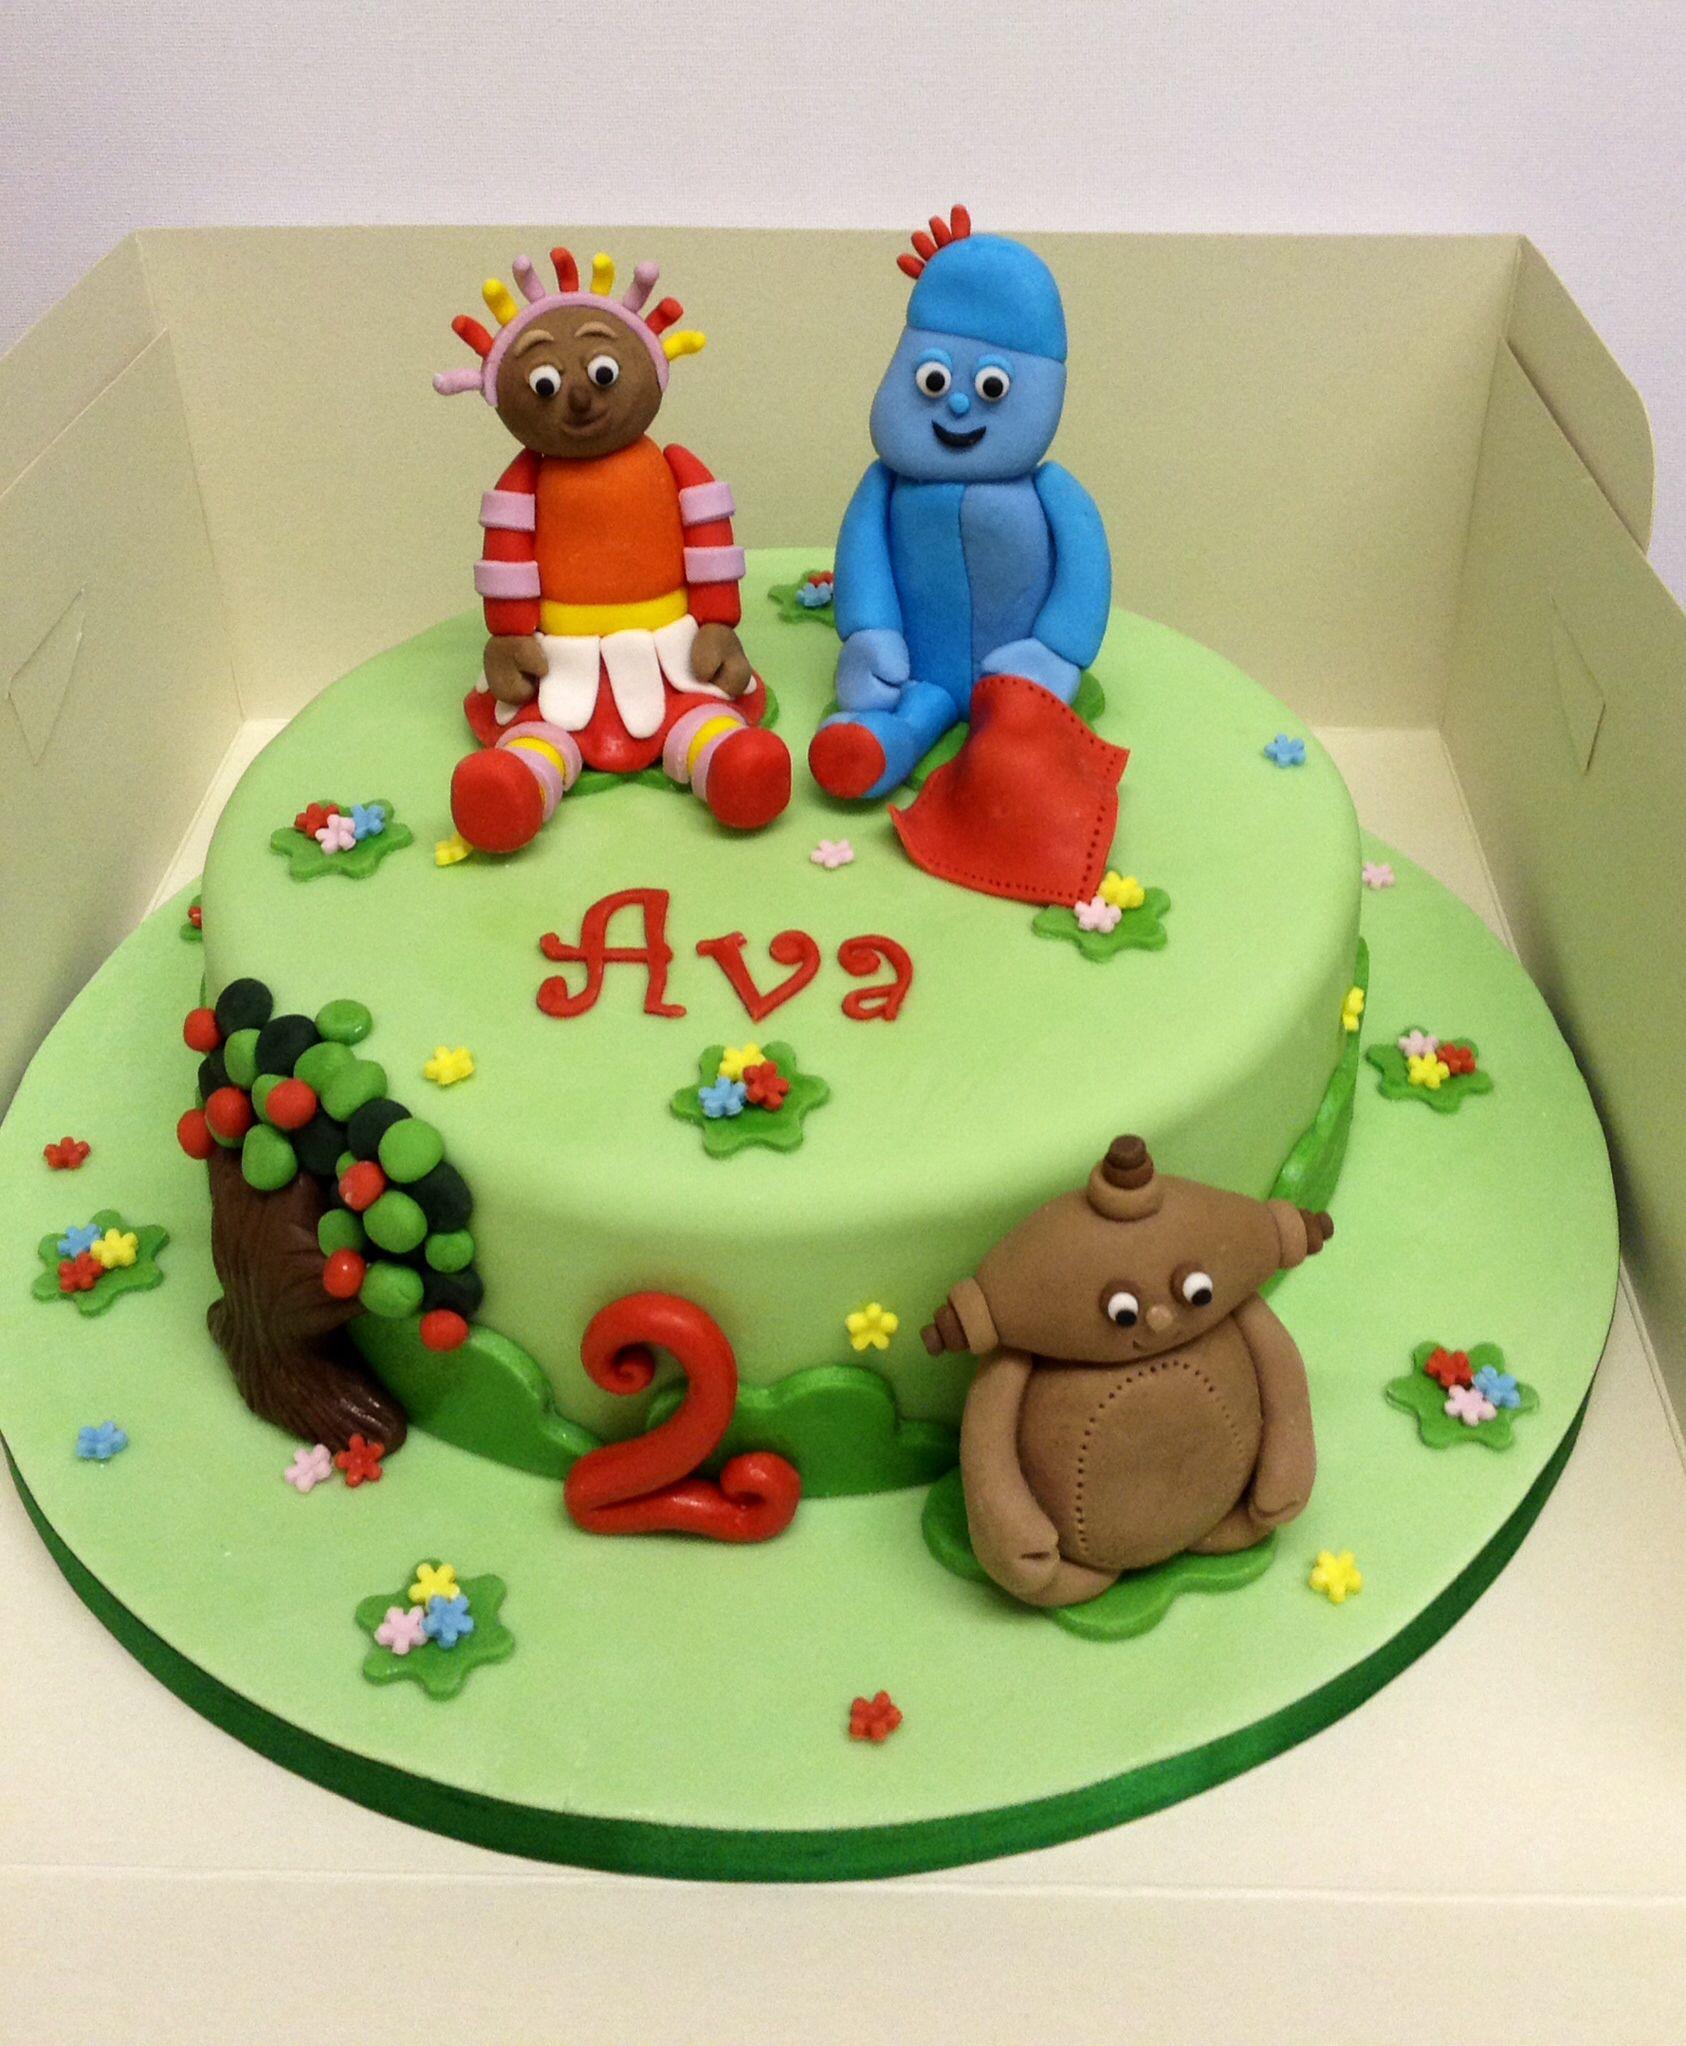 in the night garden birthday cake cakes pinterest On in the night garden birthday cake designs